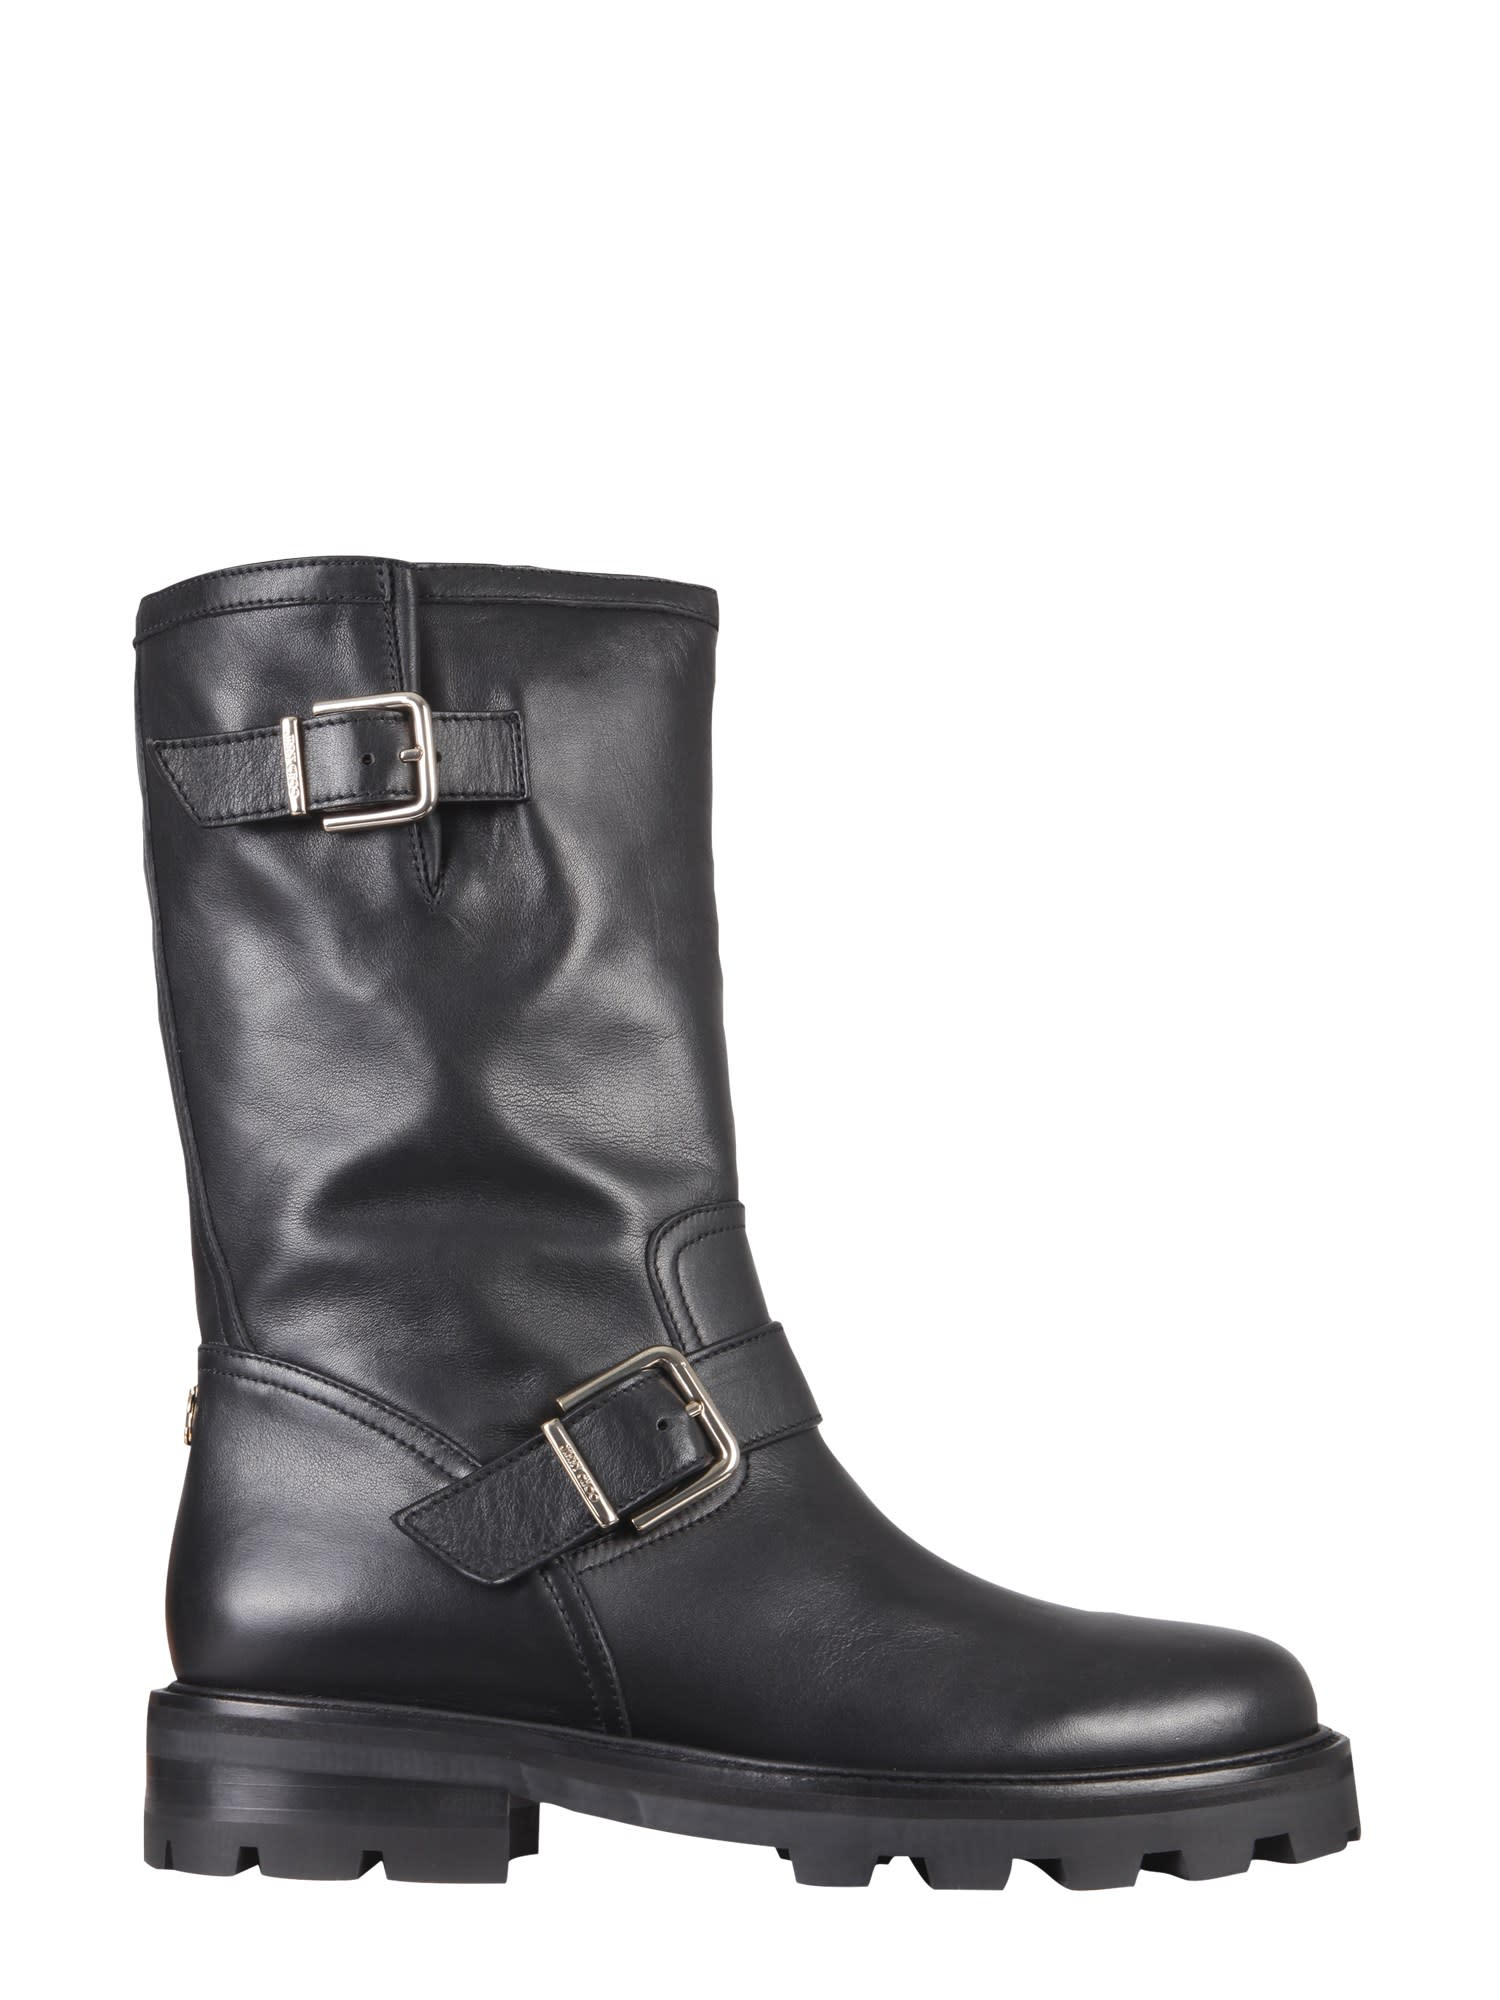 Buy Jimmy Choo Biker Ii Boots online, shop Jimmy Choo shoes with free shipping